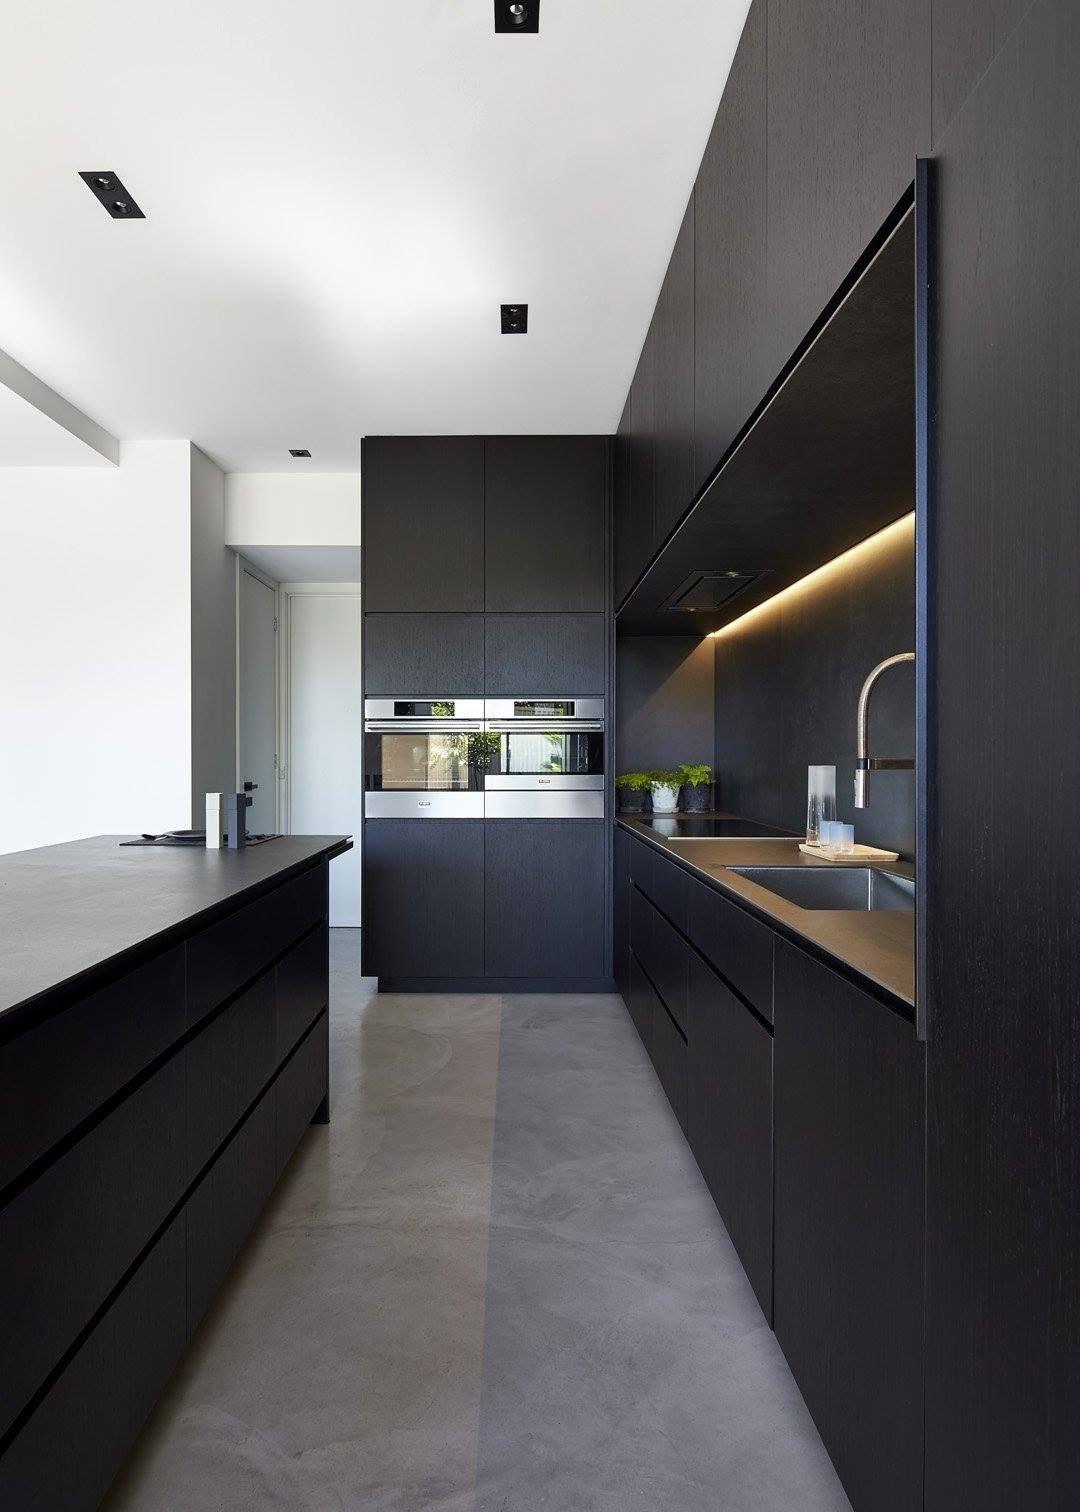 39 Beautiful Matte Black Kitchen Design Ideas Homiku Com Küchen Design Küchendesign Küchenmöbel